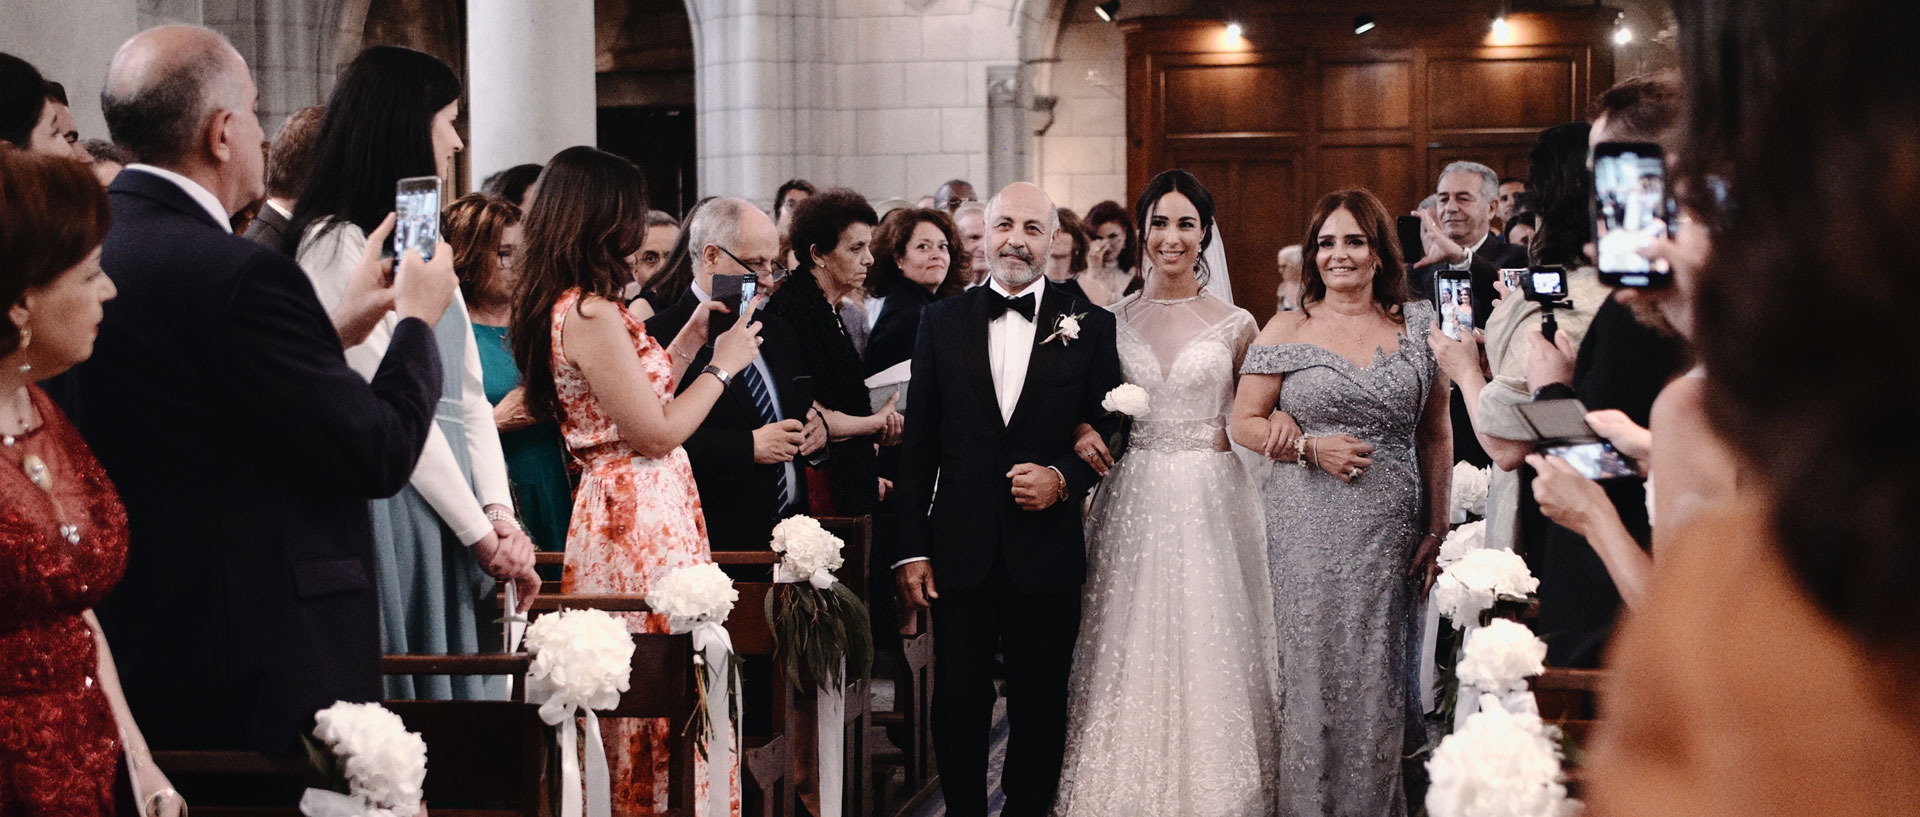 Natasha & Jad Wedding - Casino Biarritz (33).jpg